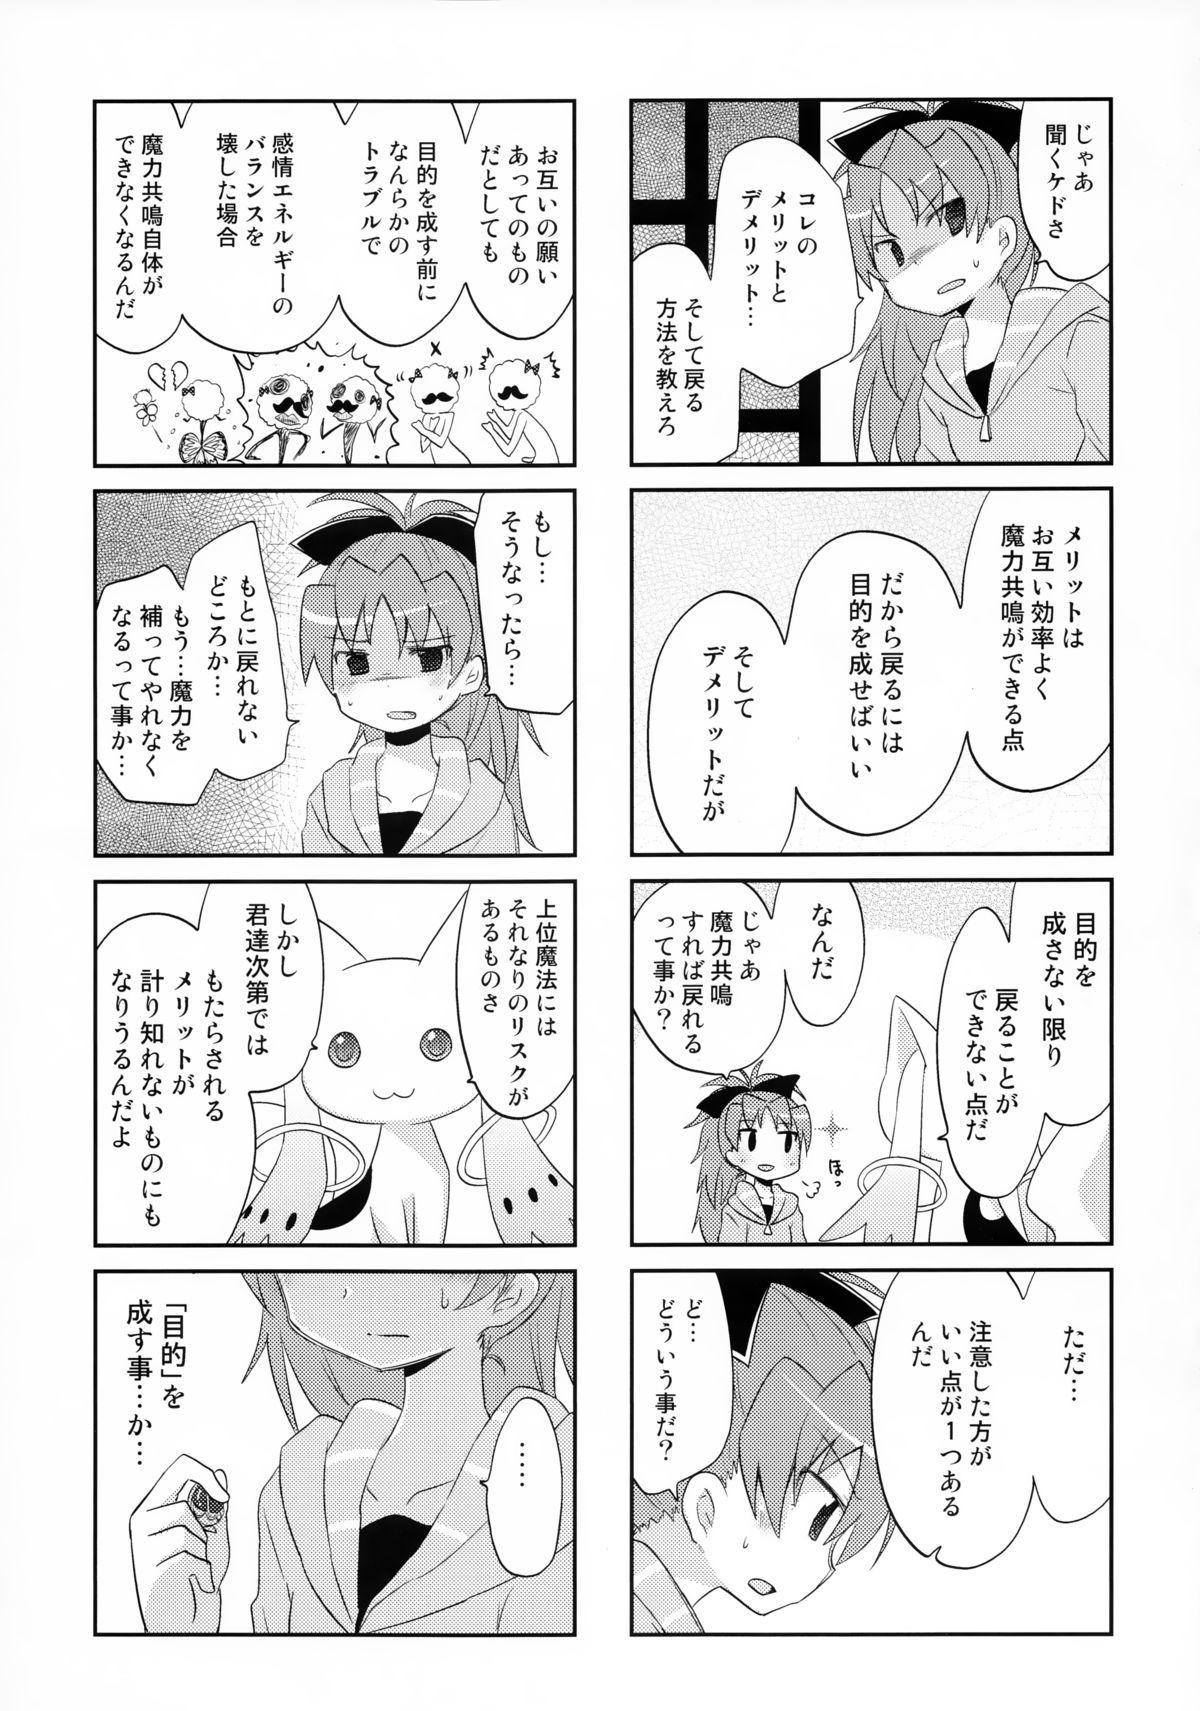 Futari no Hatsukousen 3